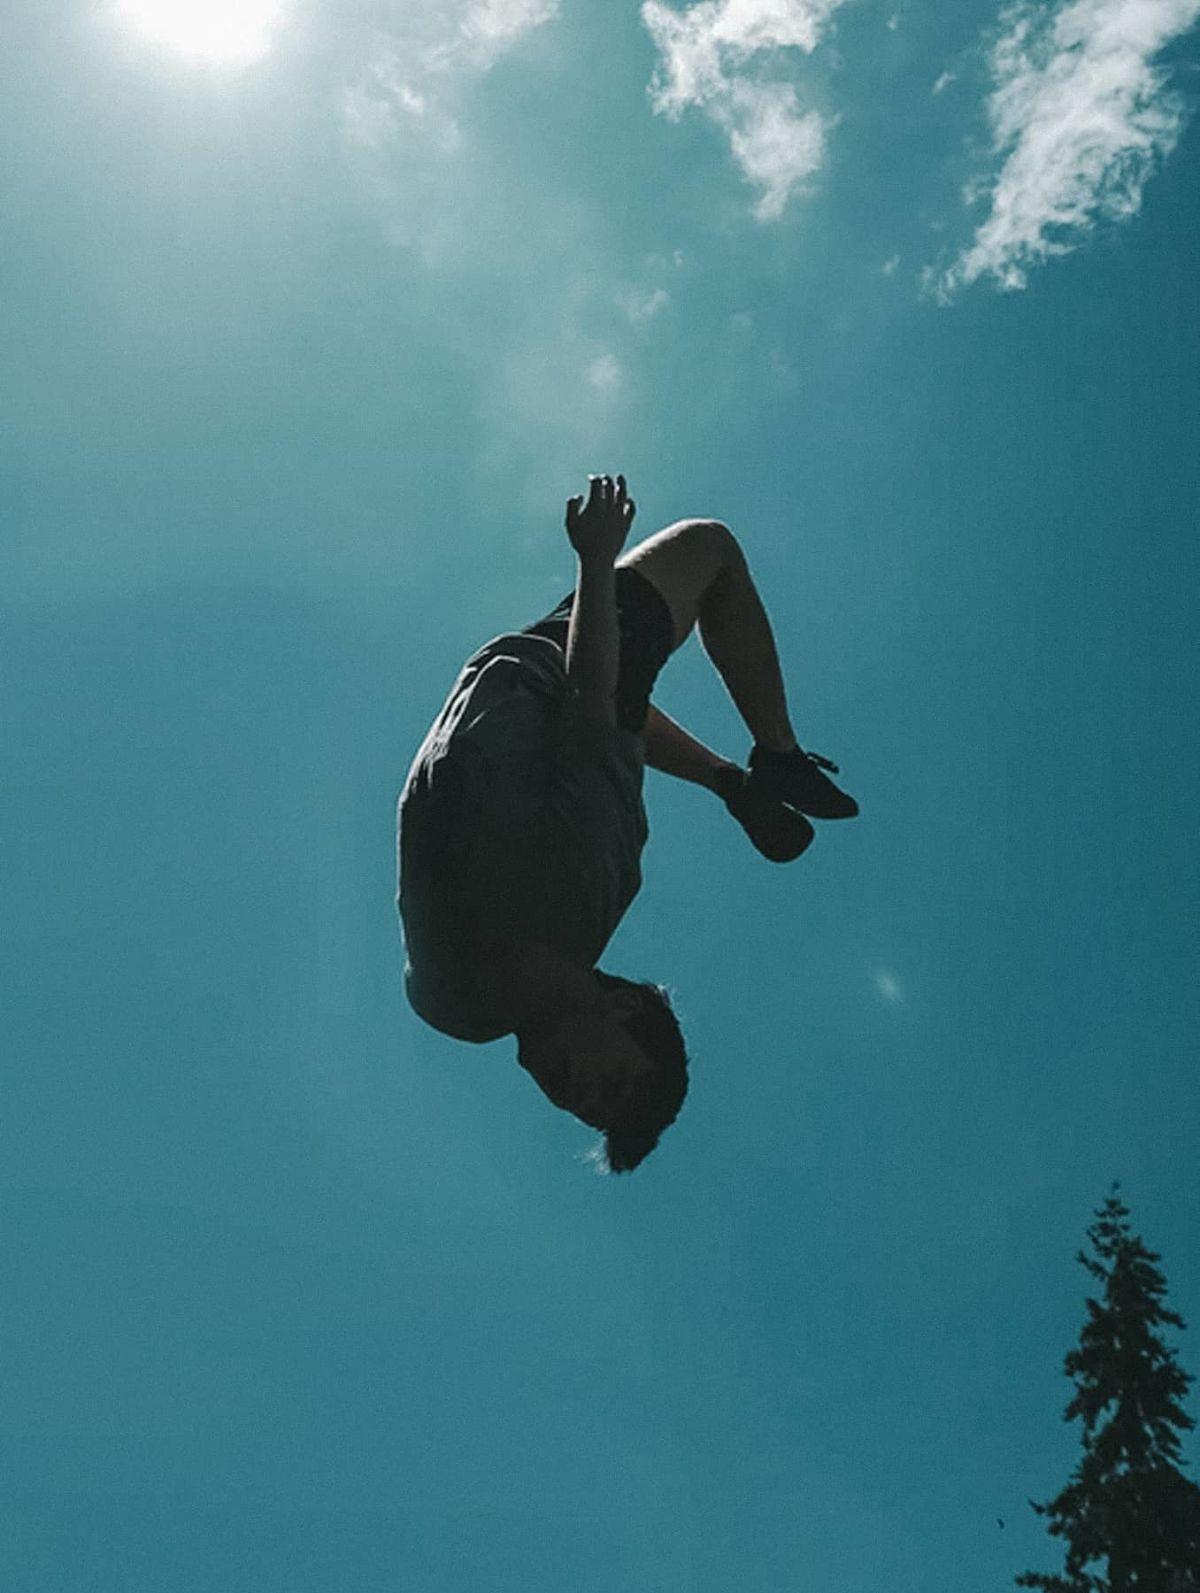 BLVR Journal Rediscovering Balance & Growth Through Adventure